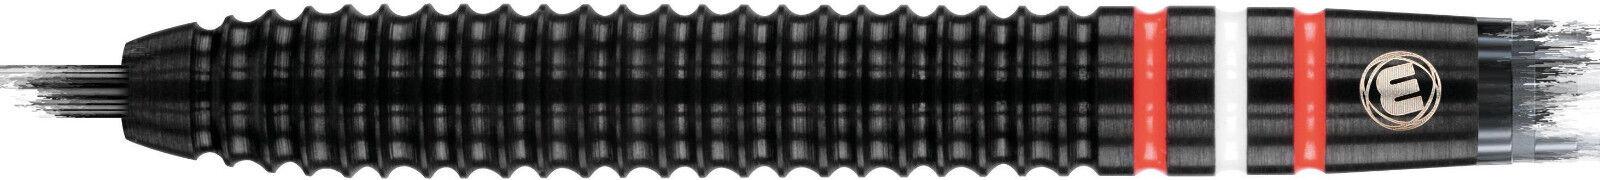 WINMAU Steel Darts Steeldarts Dartpfeile Pfeile Dartpfeile Steeldarts Darts Pro-Line 25 gr. 1421 f11c36